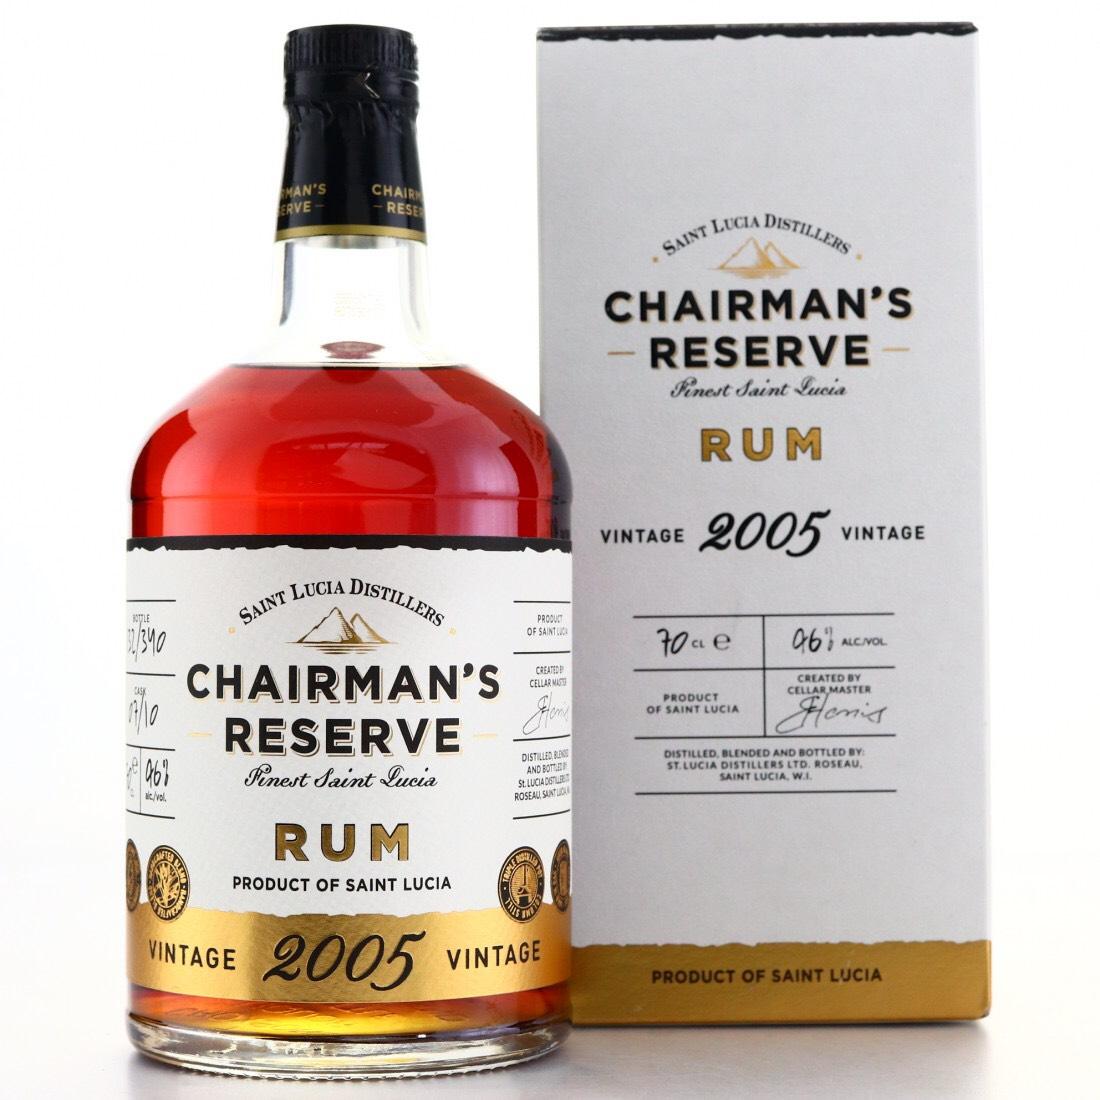 Bottle image of Chairman's Reserve Vintage